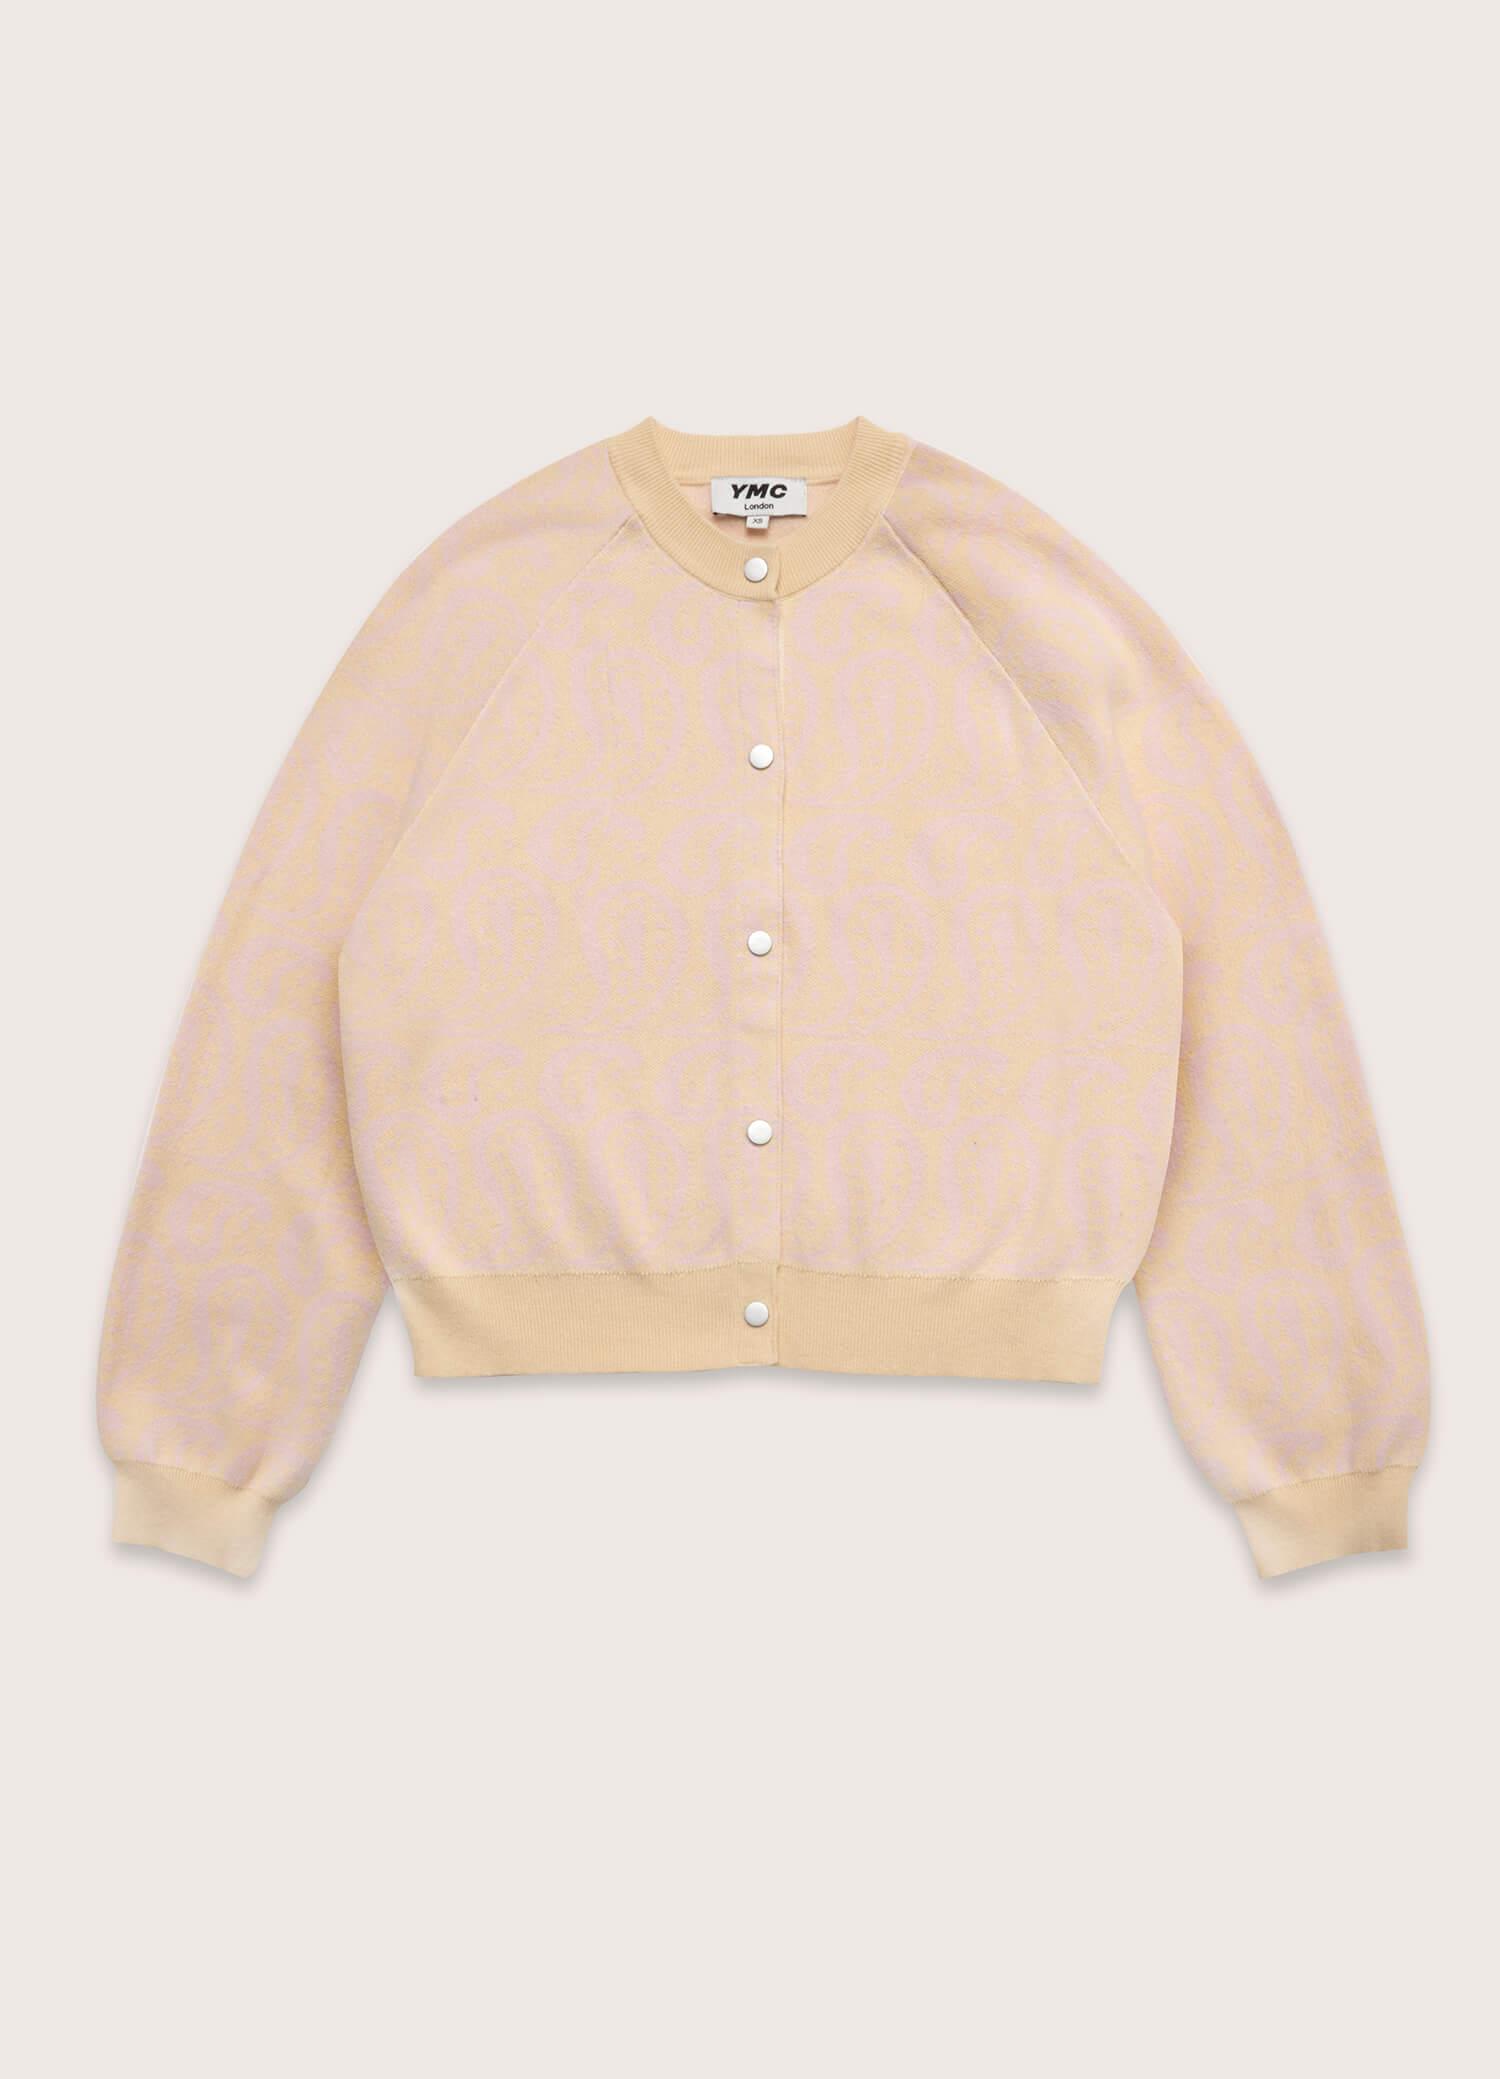 Atomic Cotton Cashmere Paisley Cardigan Yellow Pink